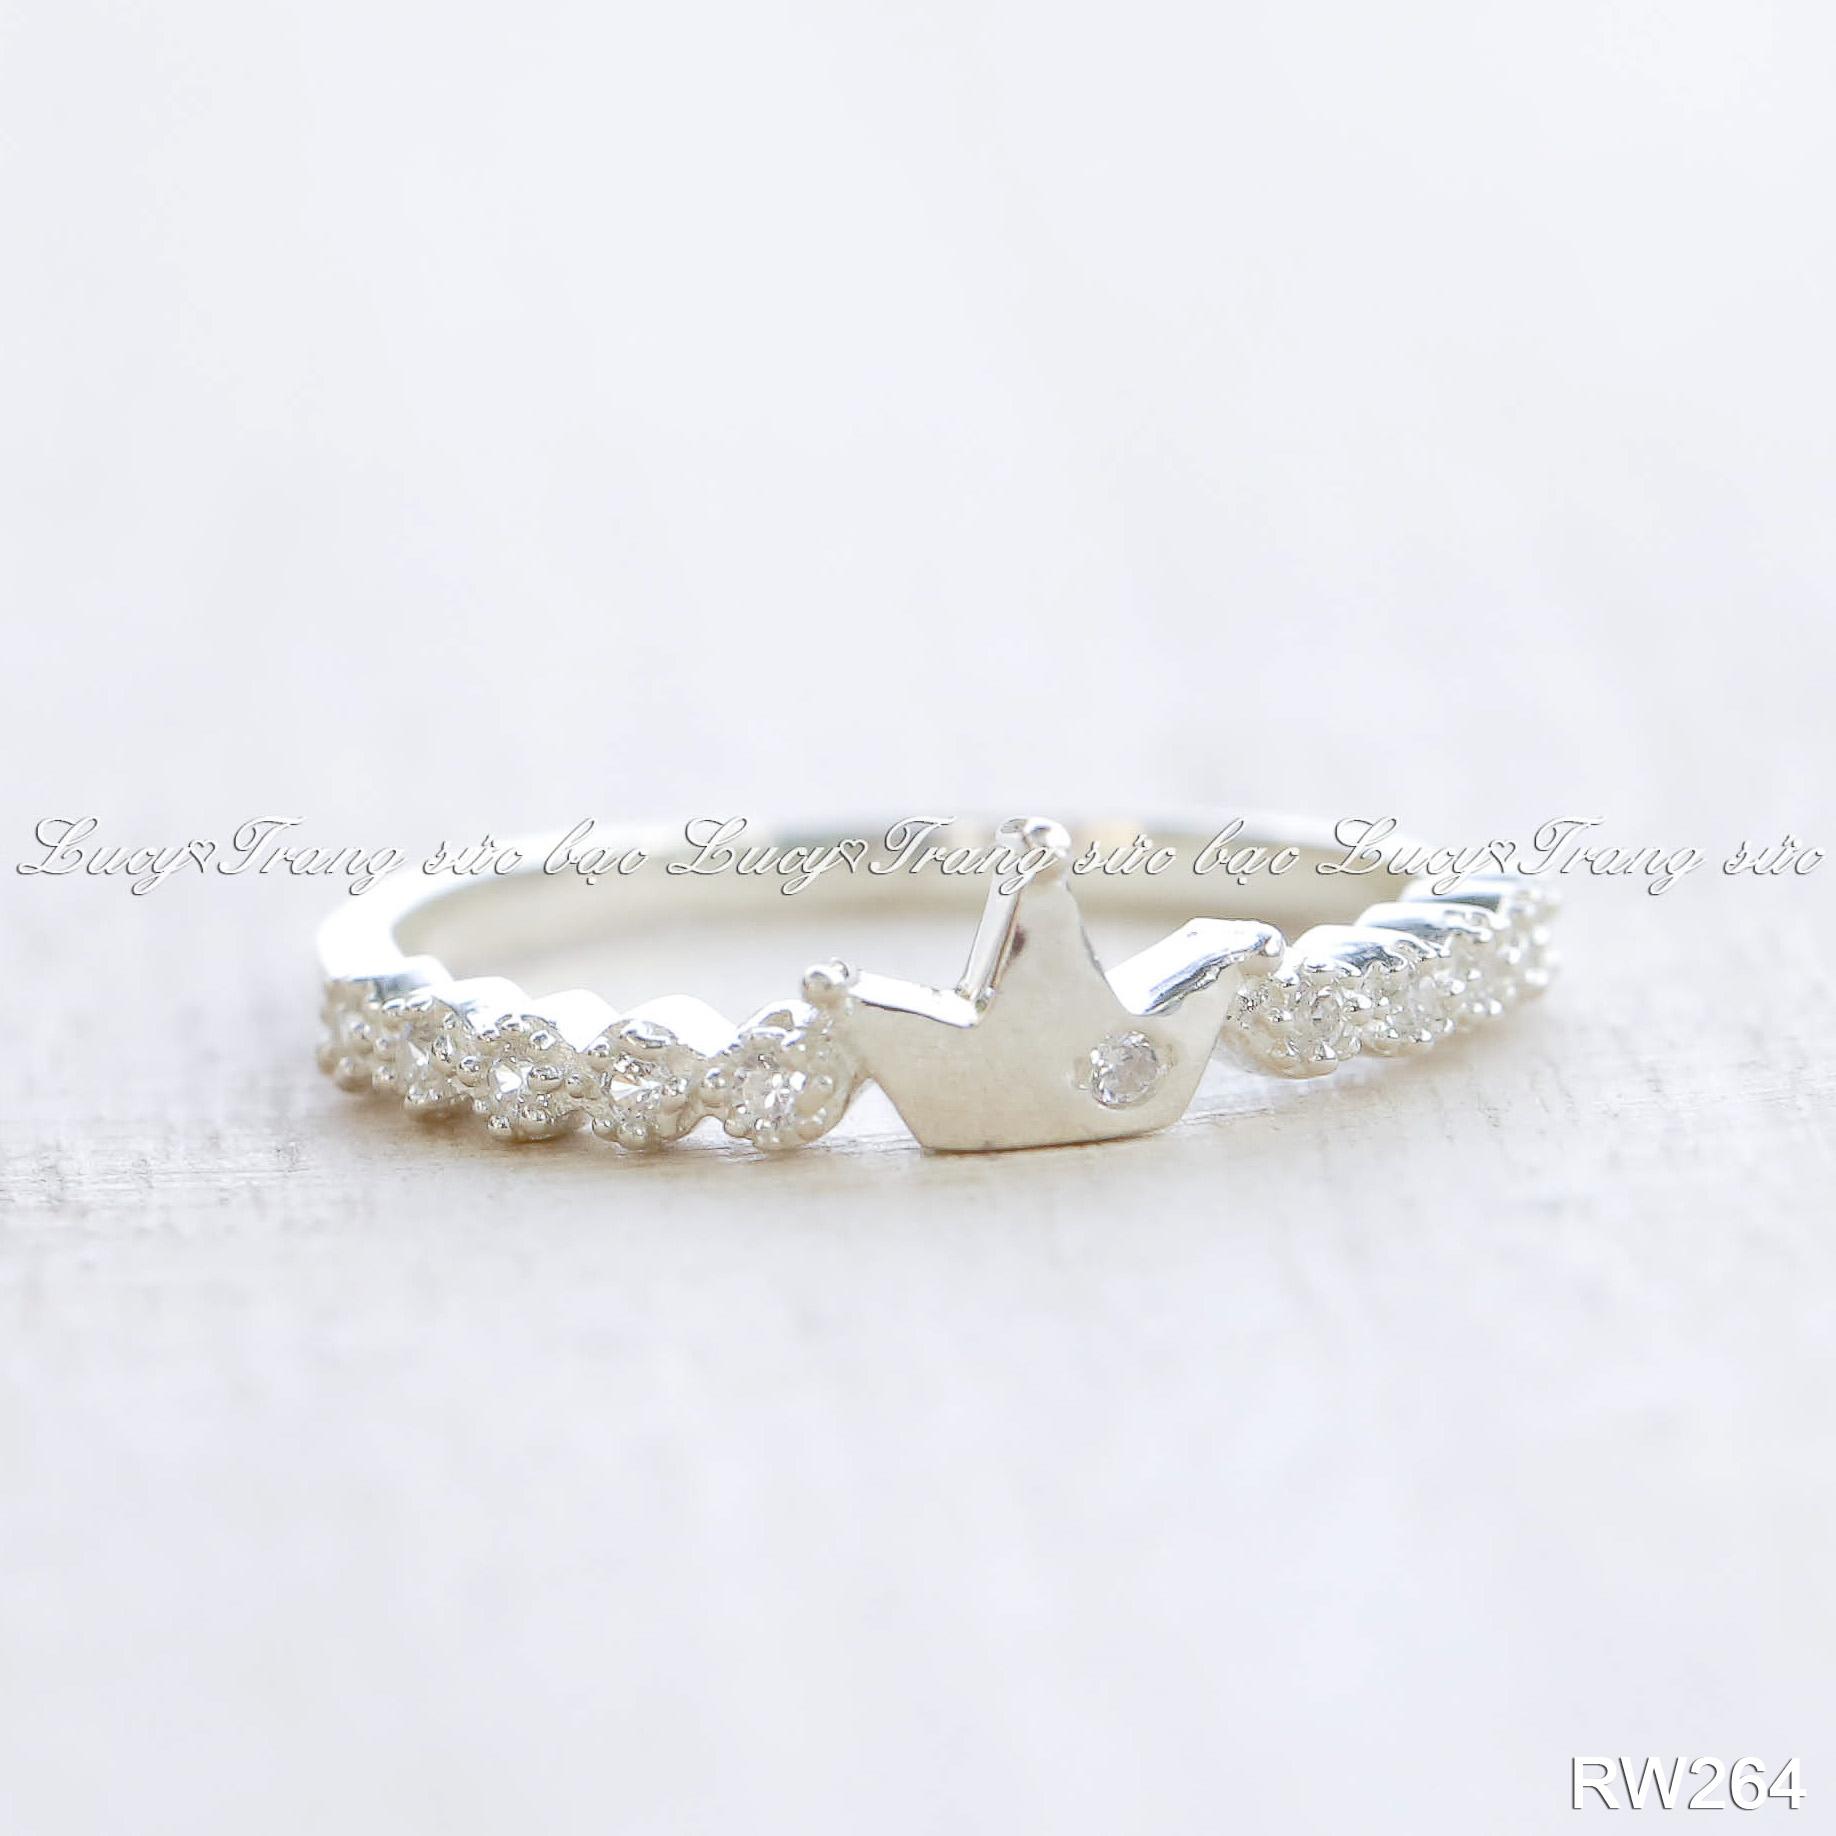 nhẫn nữ bạc lucy - rw264